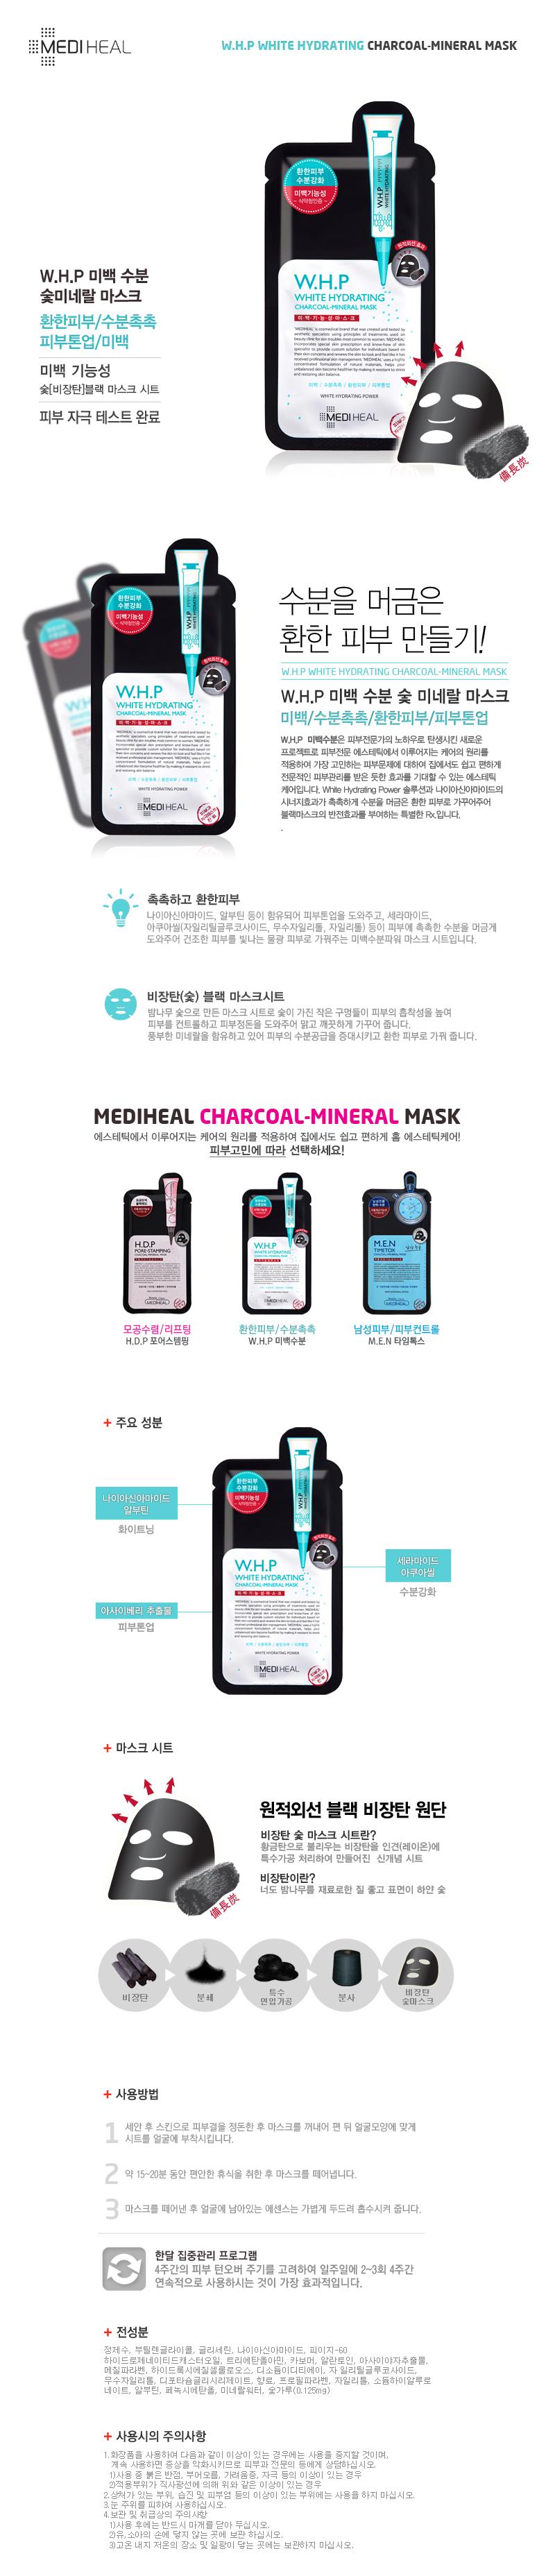 Mediheal_WHP_Charcol_Mask.jpg